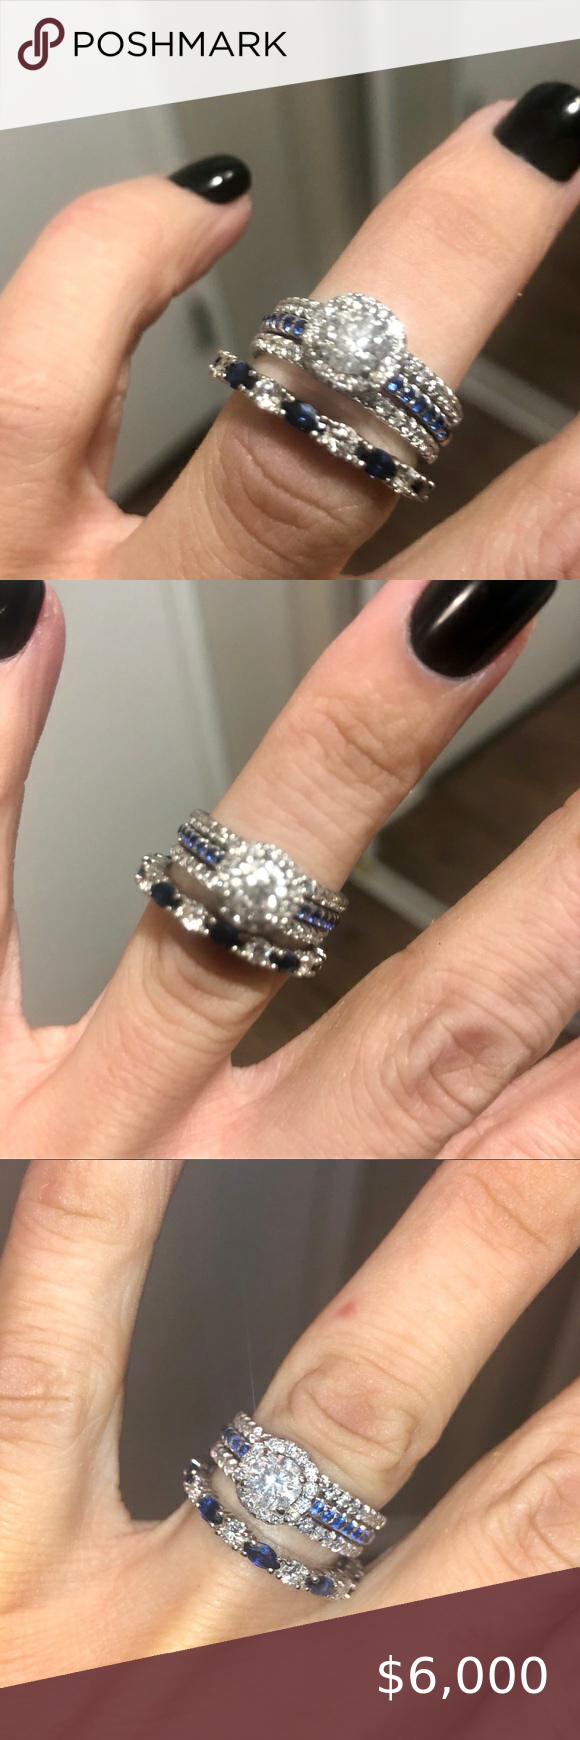 Diamond Engagement, Bridal & Anniversary Set in 2020